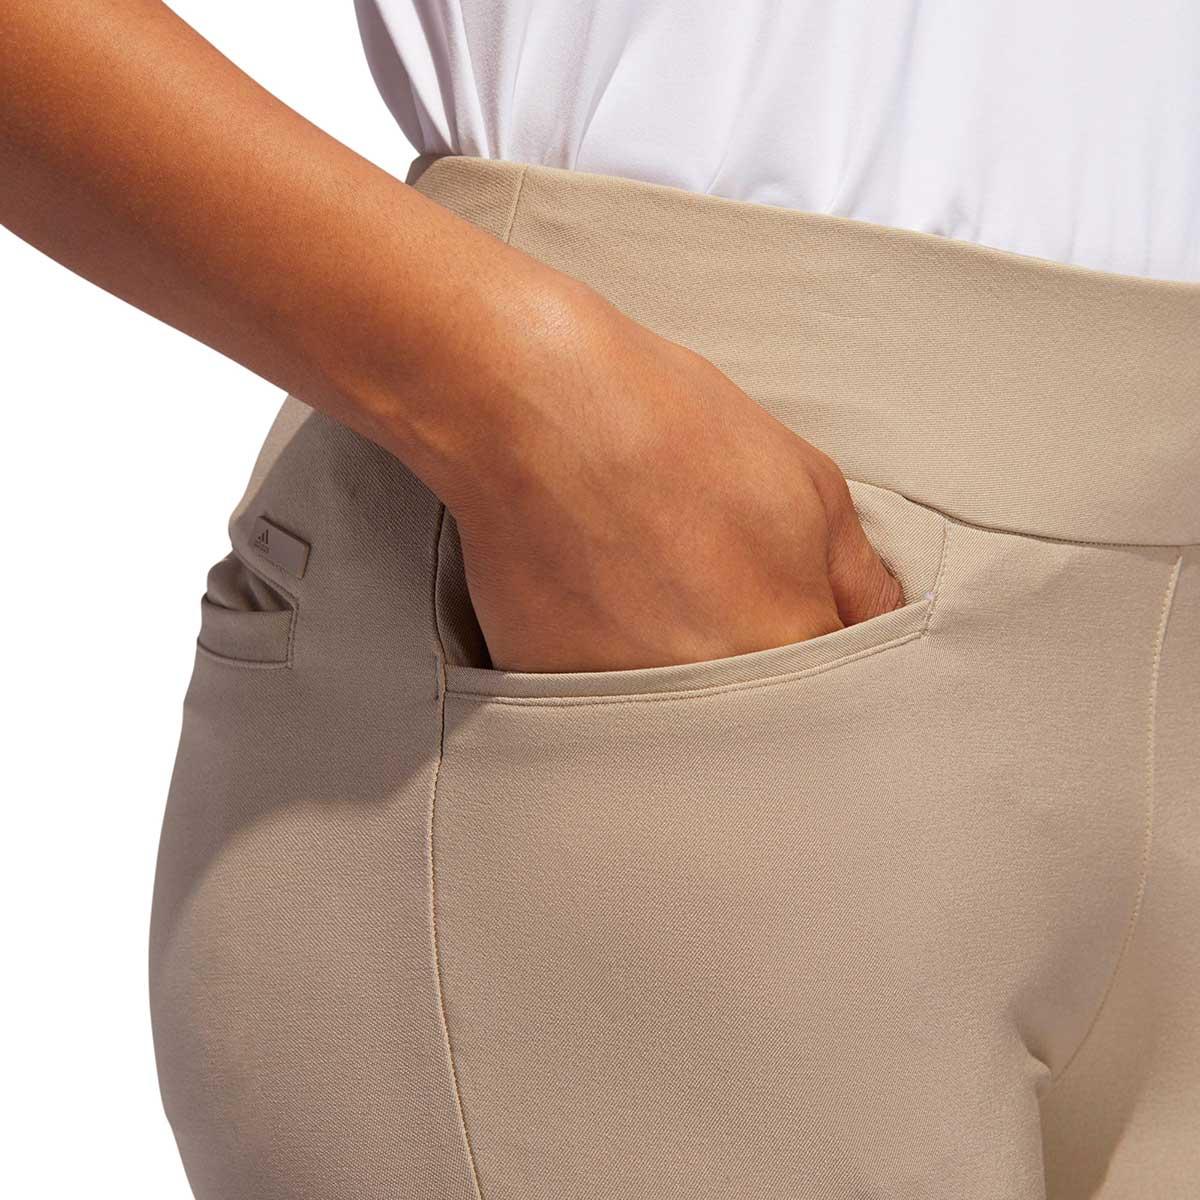 Adidas Women's Ultimate365 AdiStar Cropped Khaki Pant